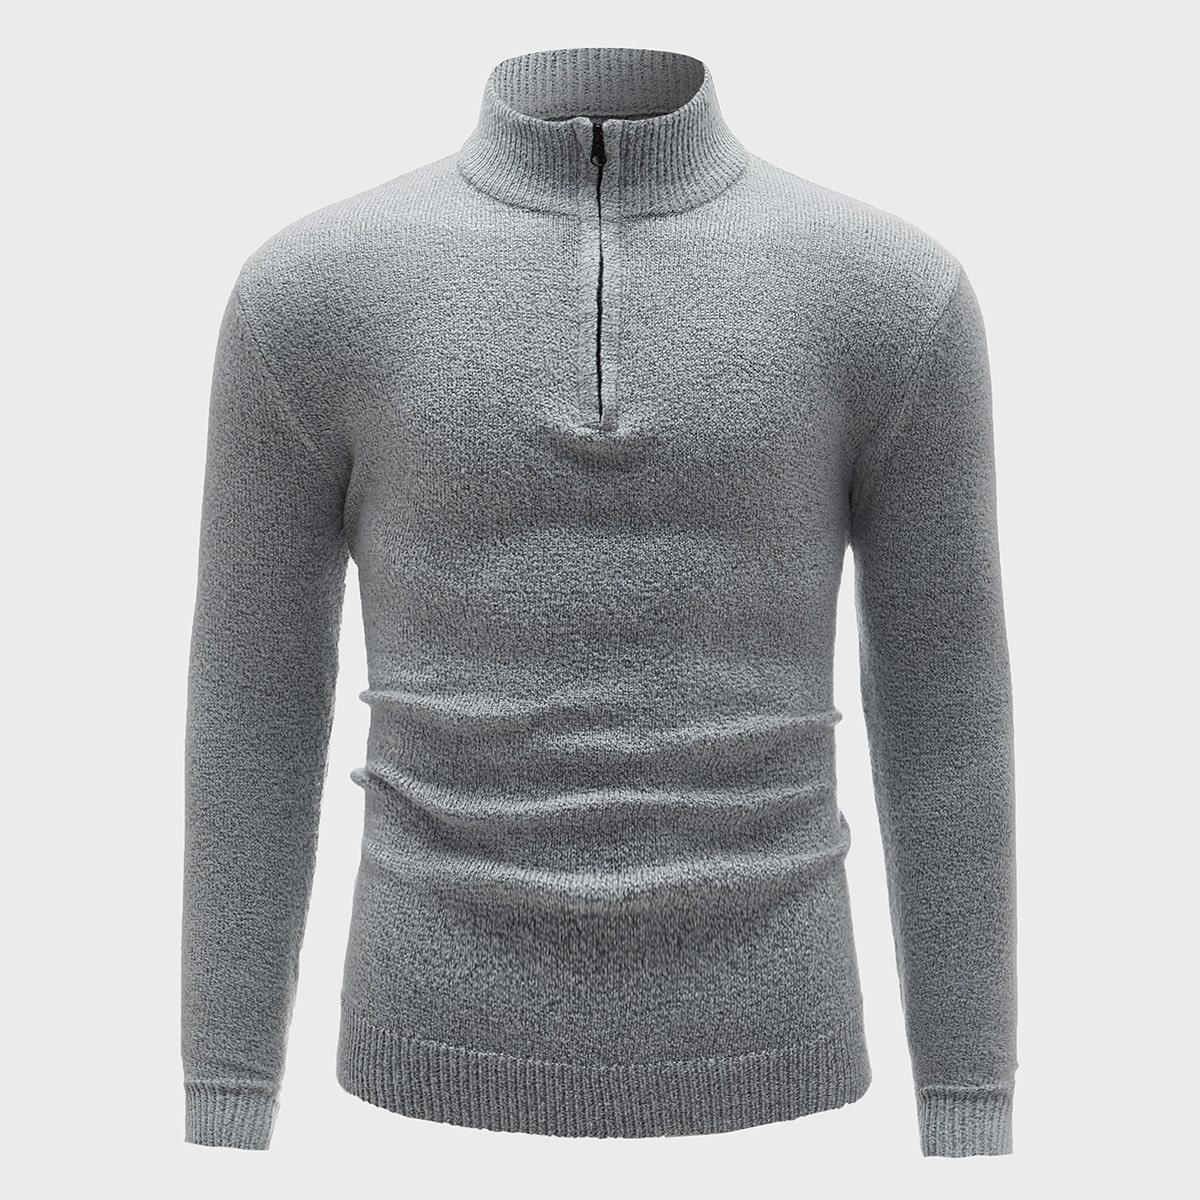 Men Half Zipper Placket Solid Sweater